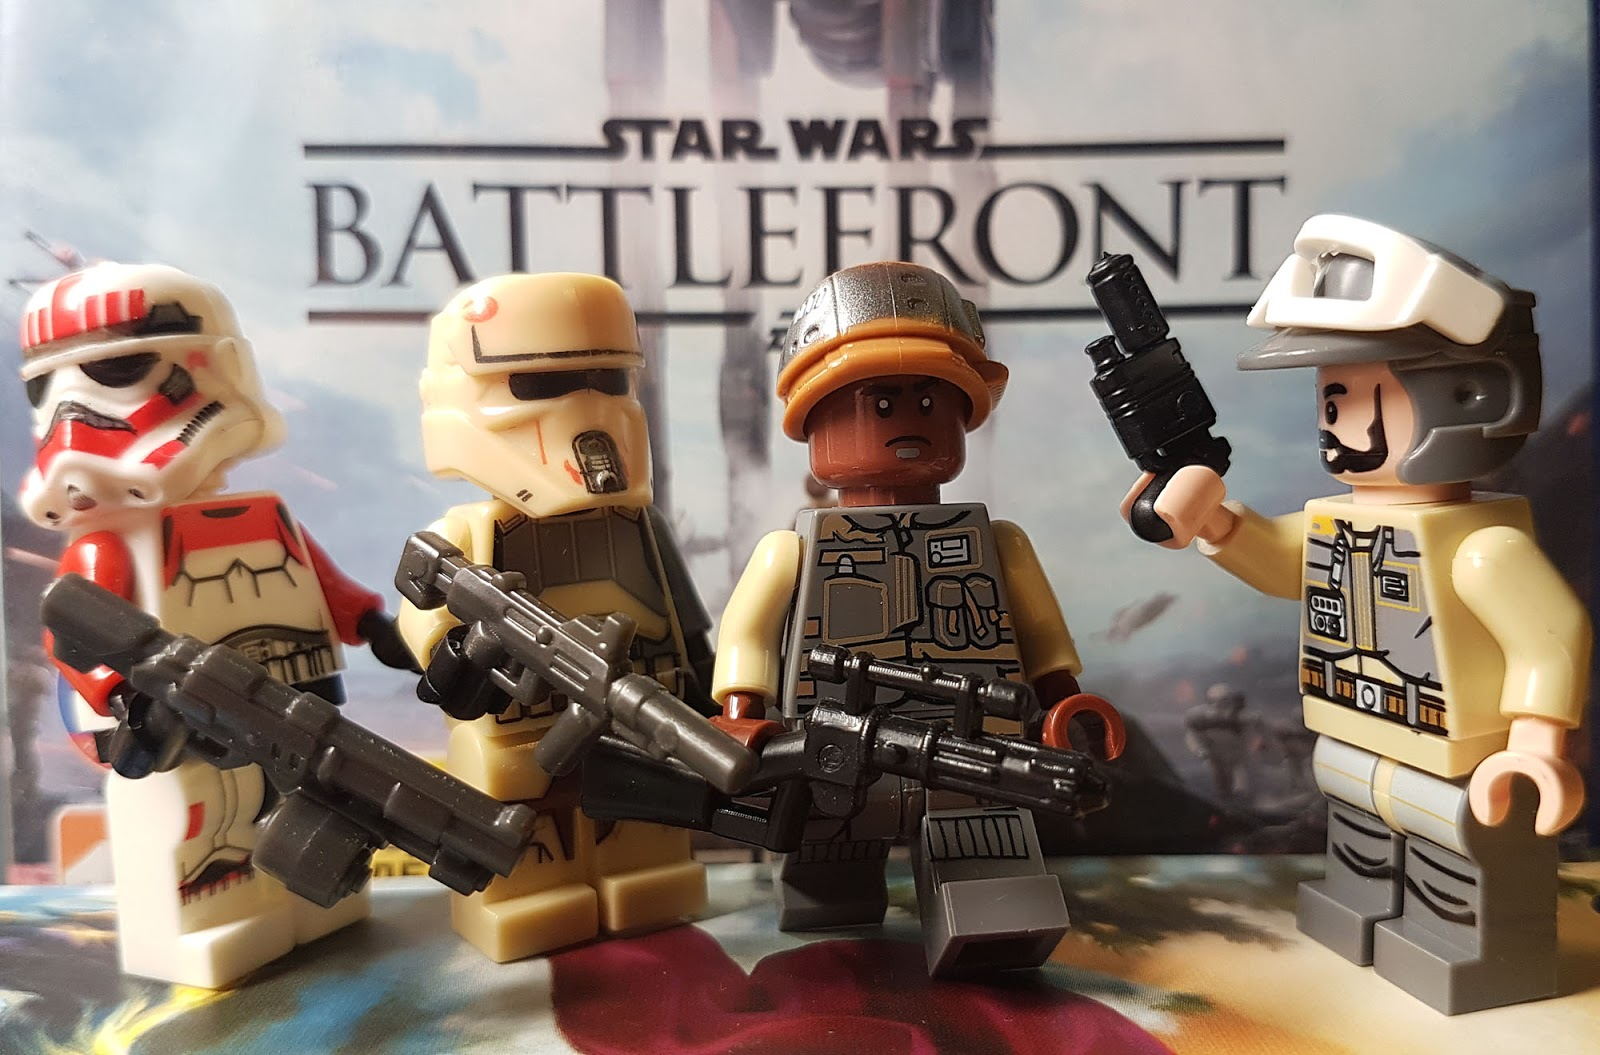 Lego Star Wars Battlefront Wallpapers